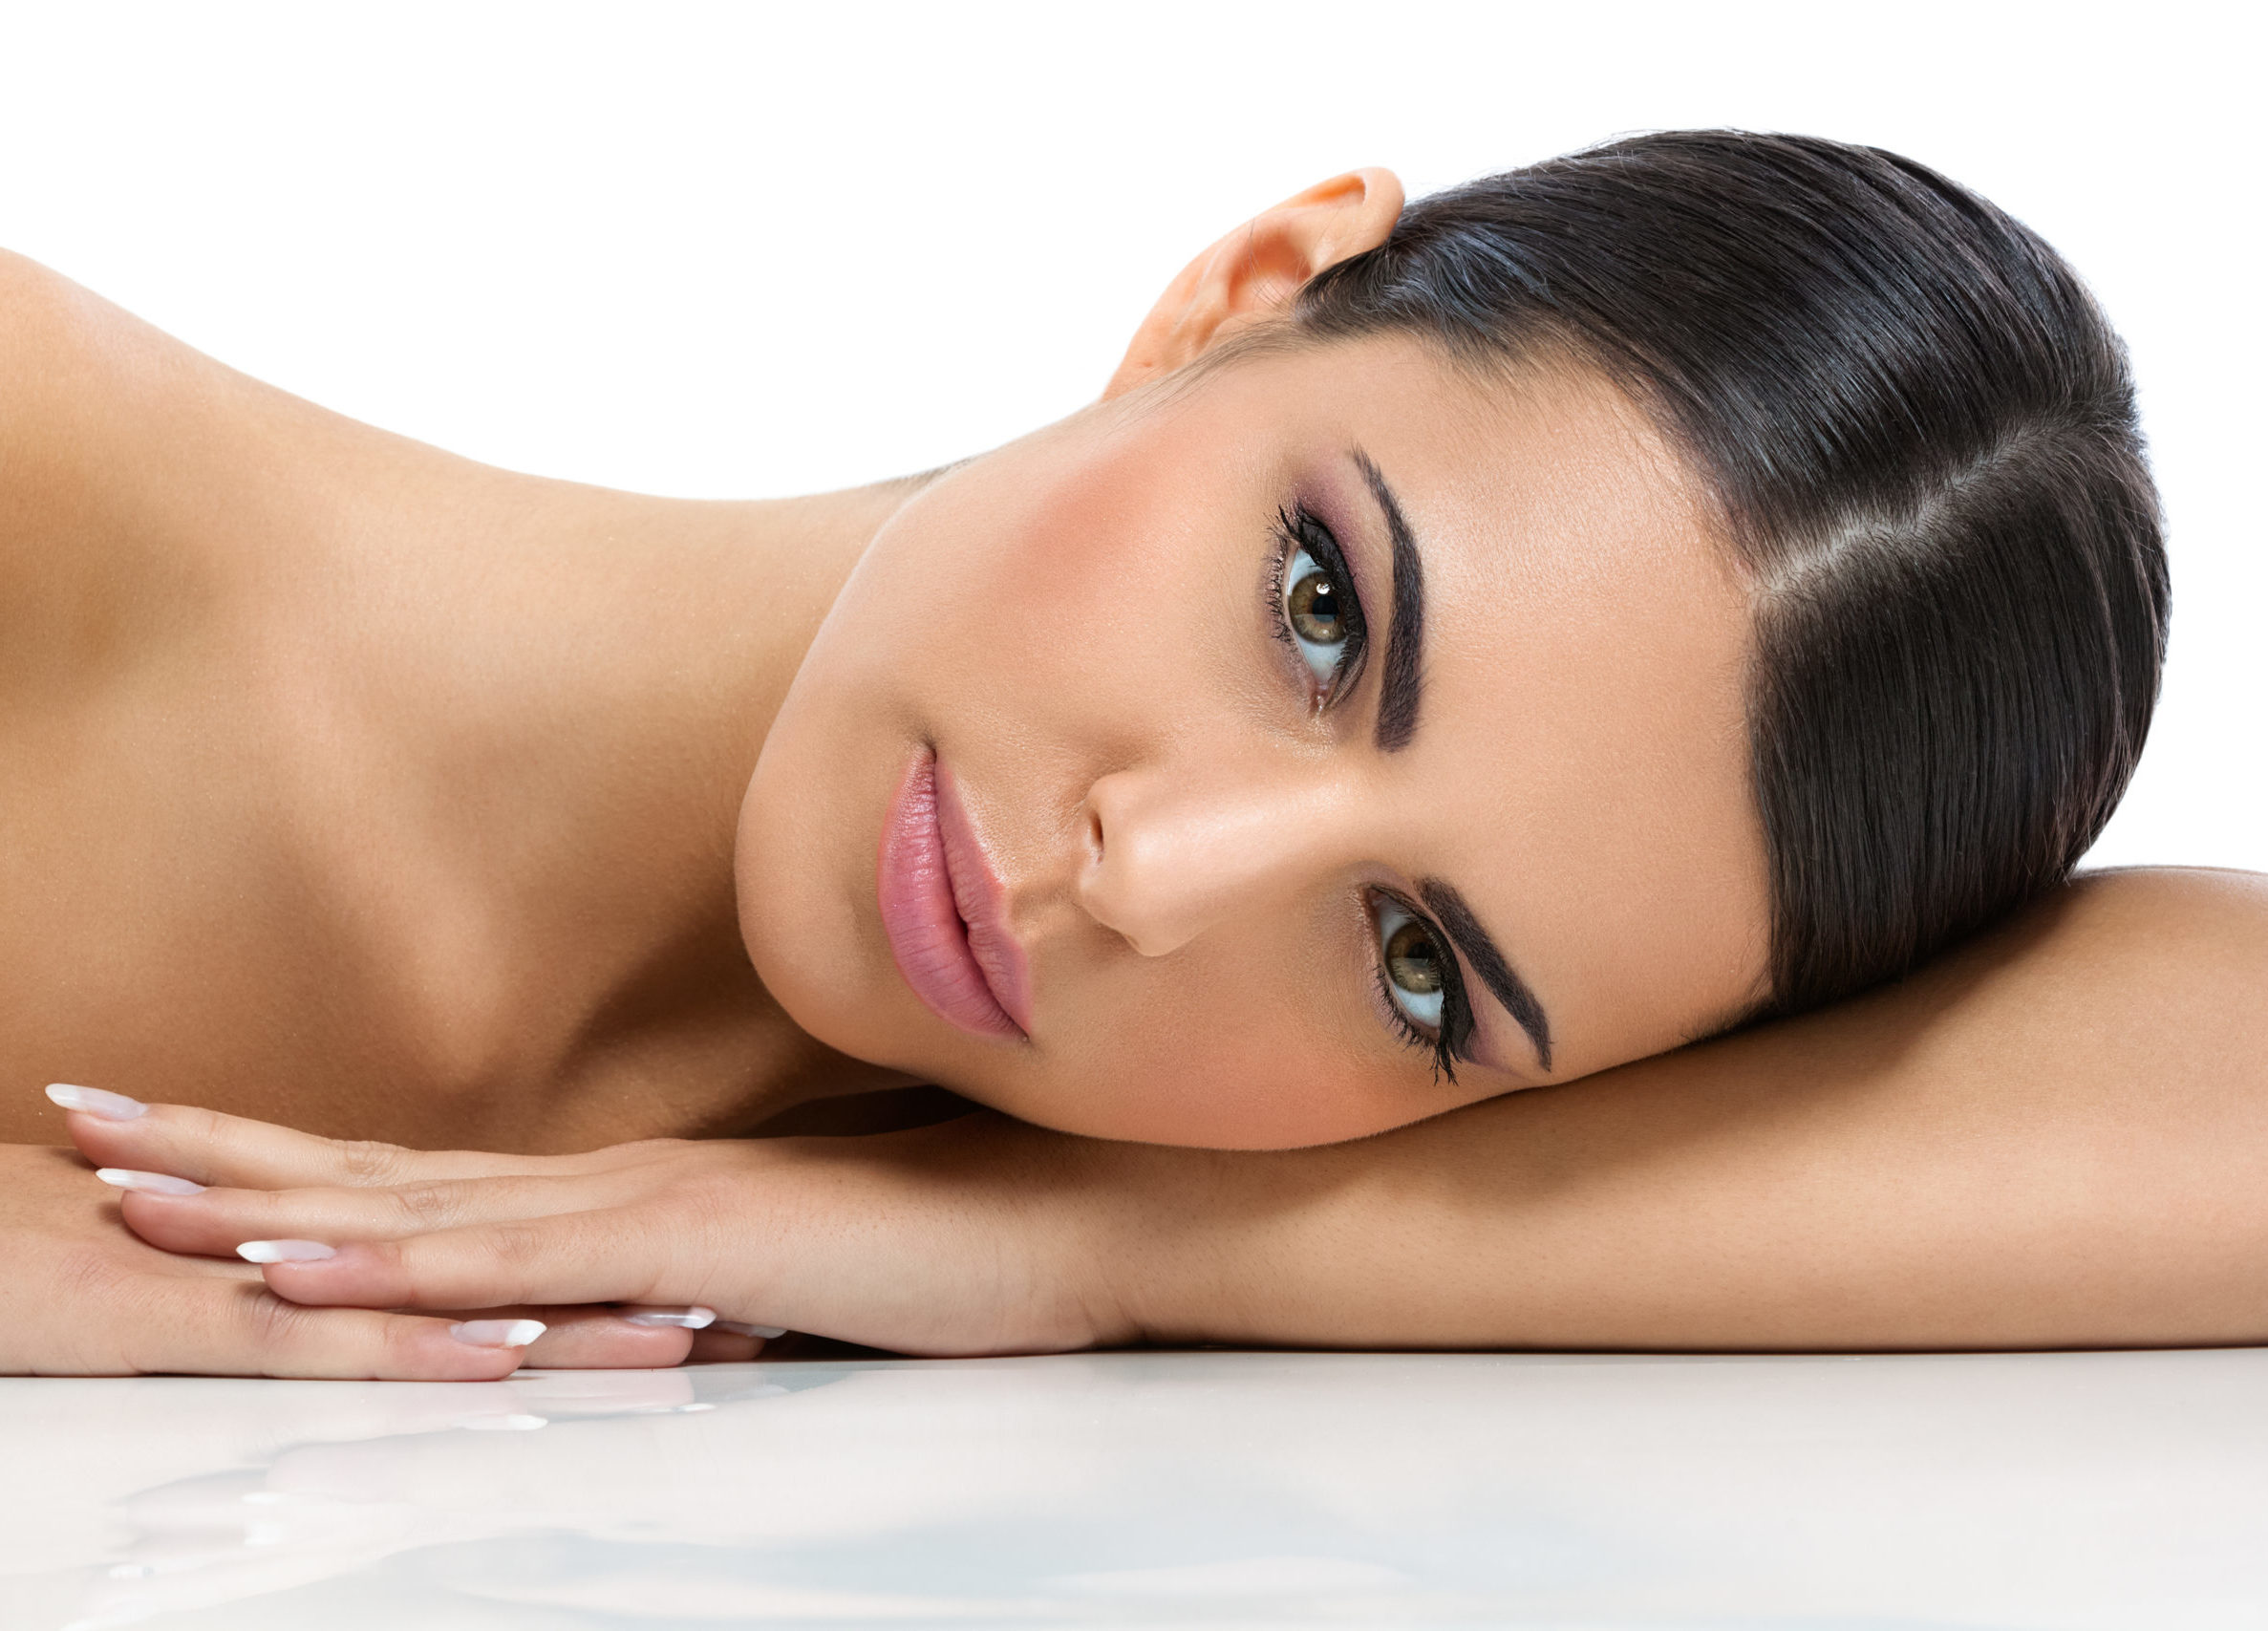 dermatolosko savetovaliste